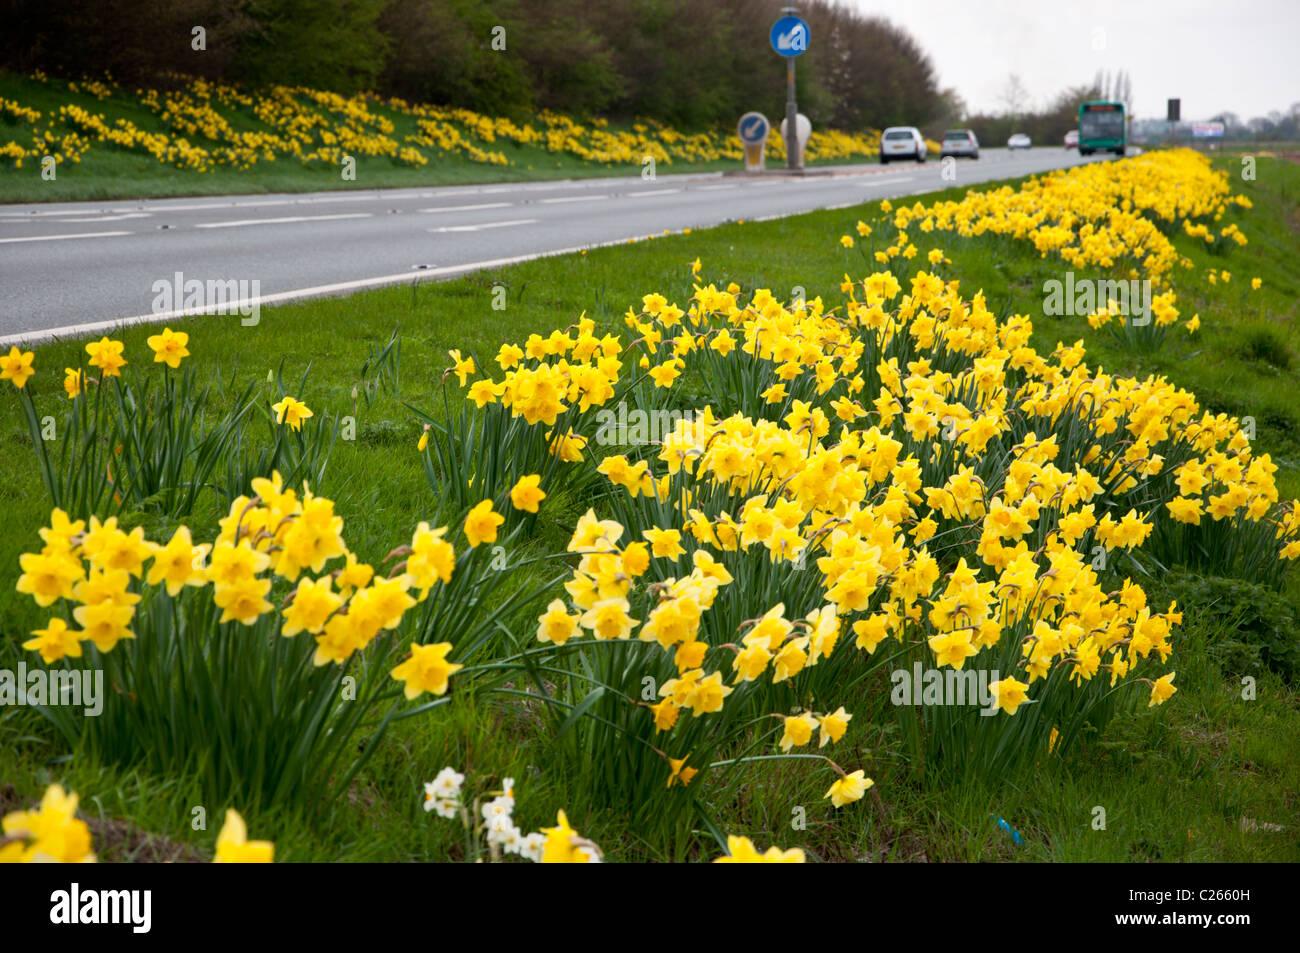 Daffodils on roadside grass verge Holbeach  Lincolnshire - Stock Image